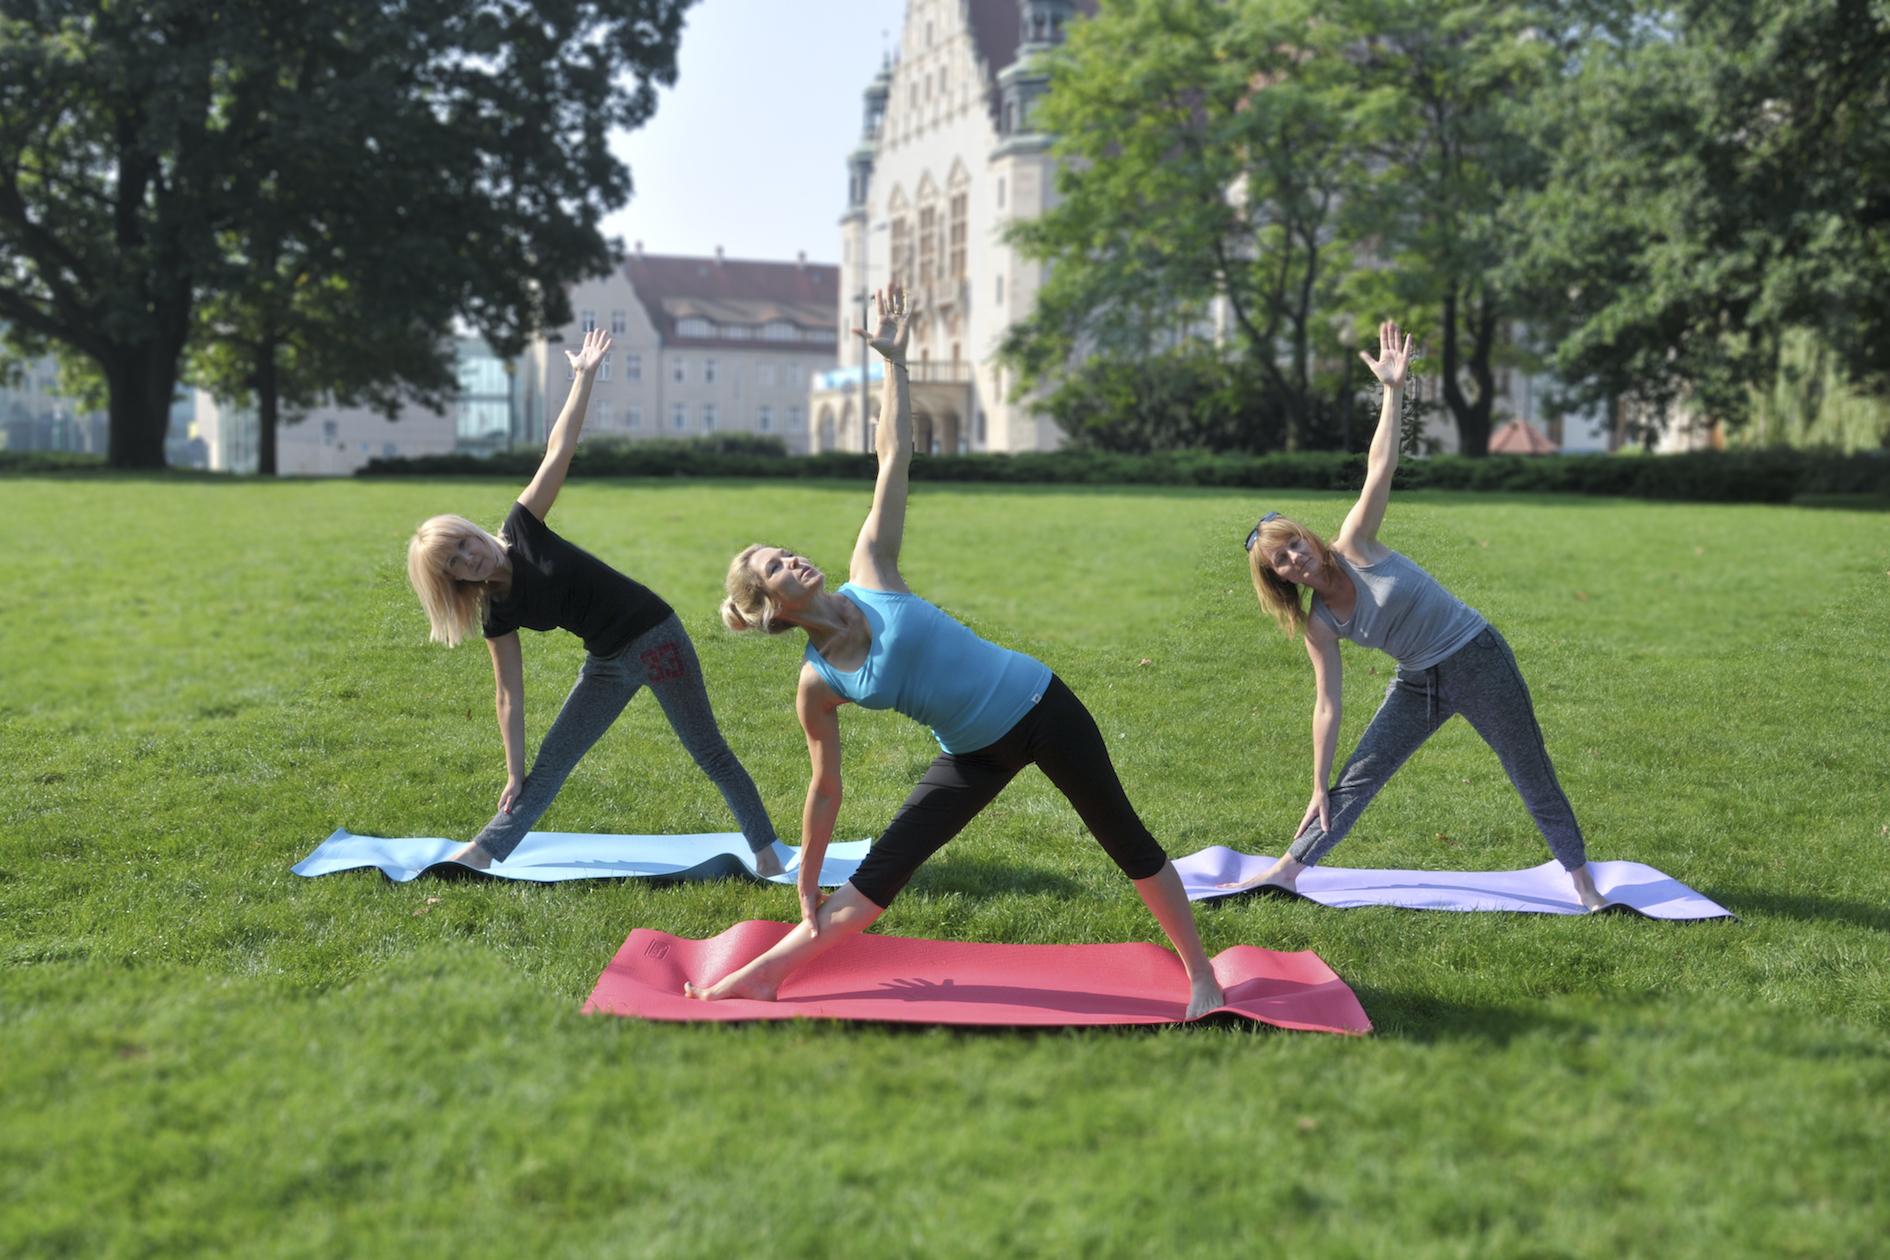 hipoalergiczni-wakacje-z-joga-kotowskaDSC_6883_1